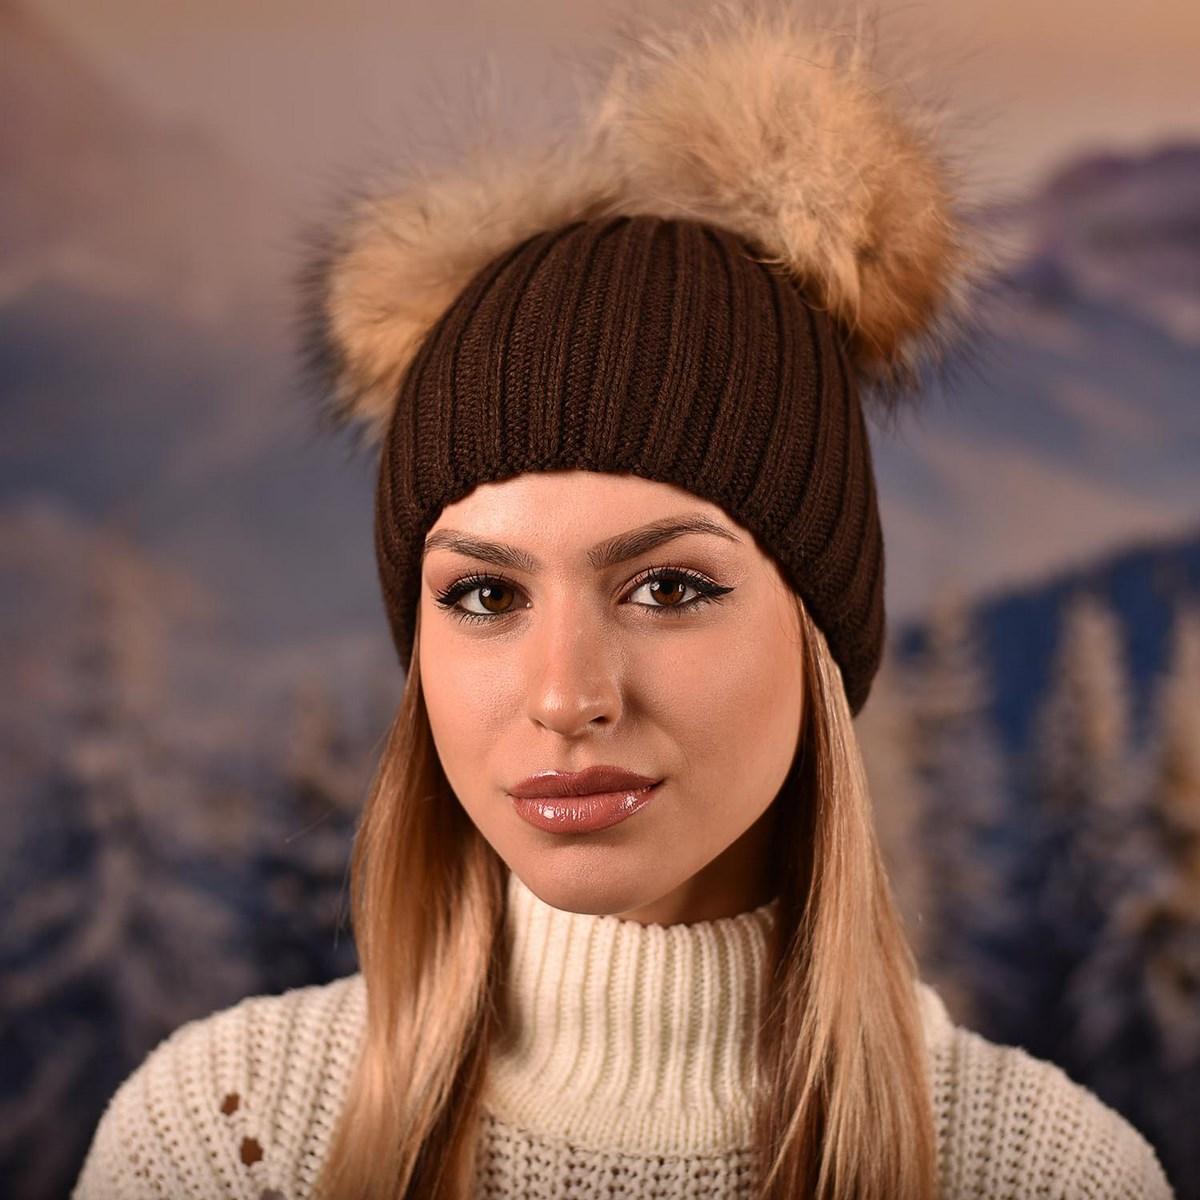 Дамска Зимна Кафява шапка с два естествени помпона